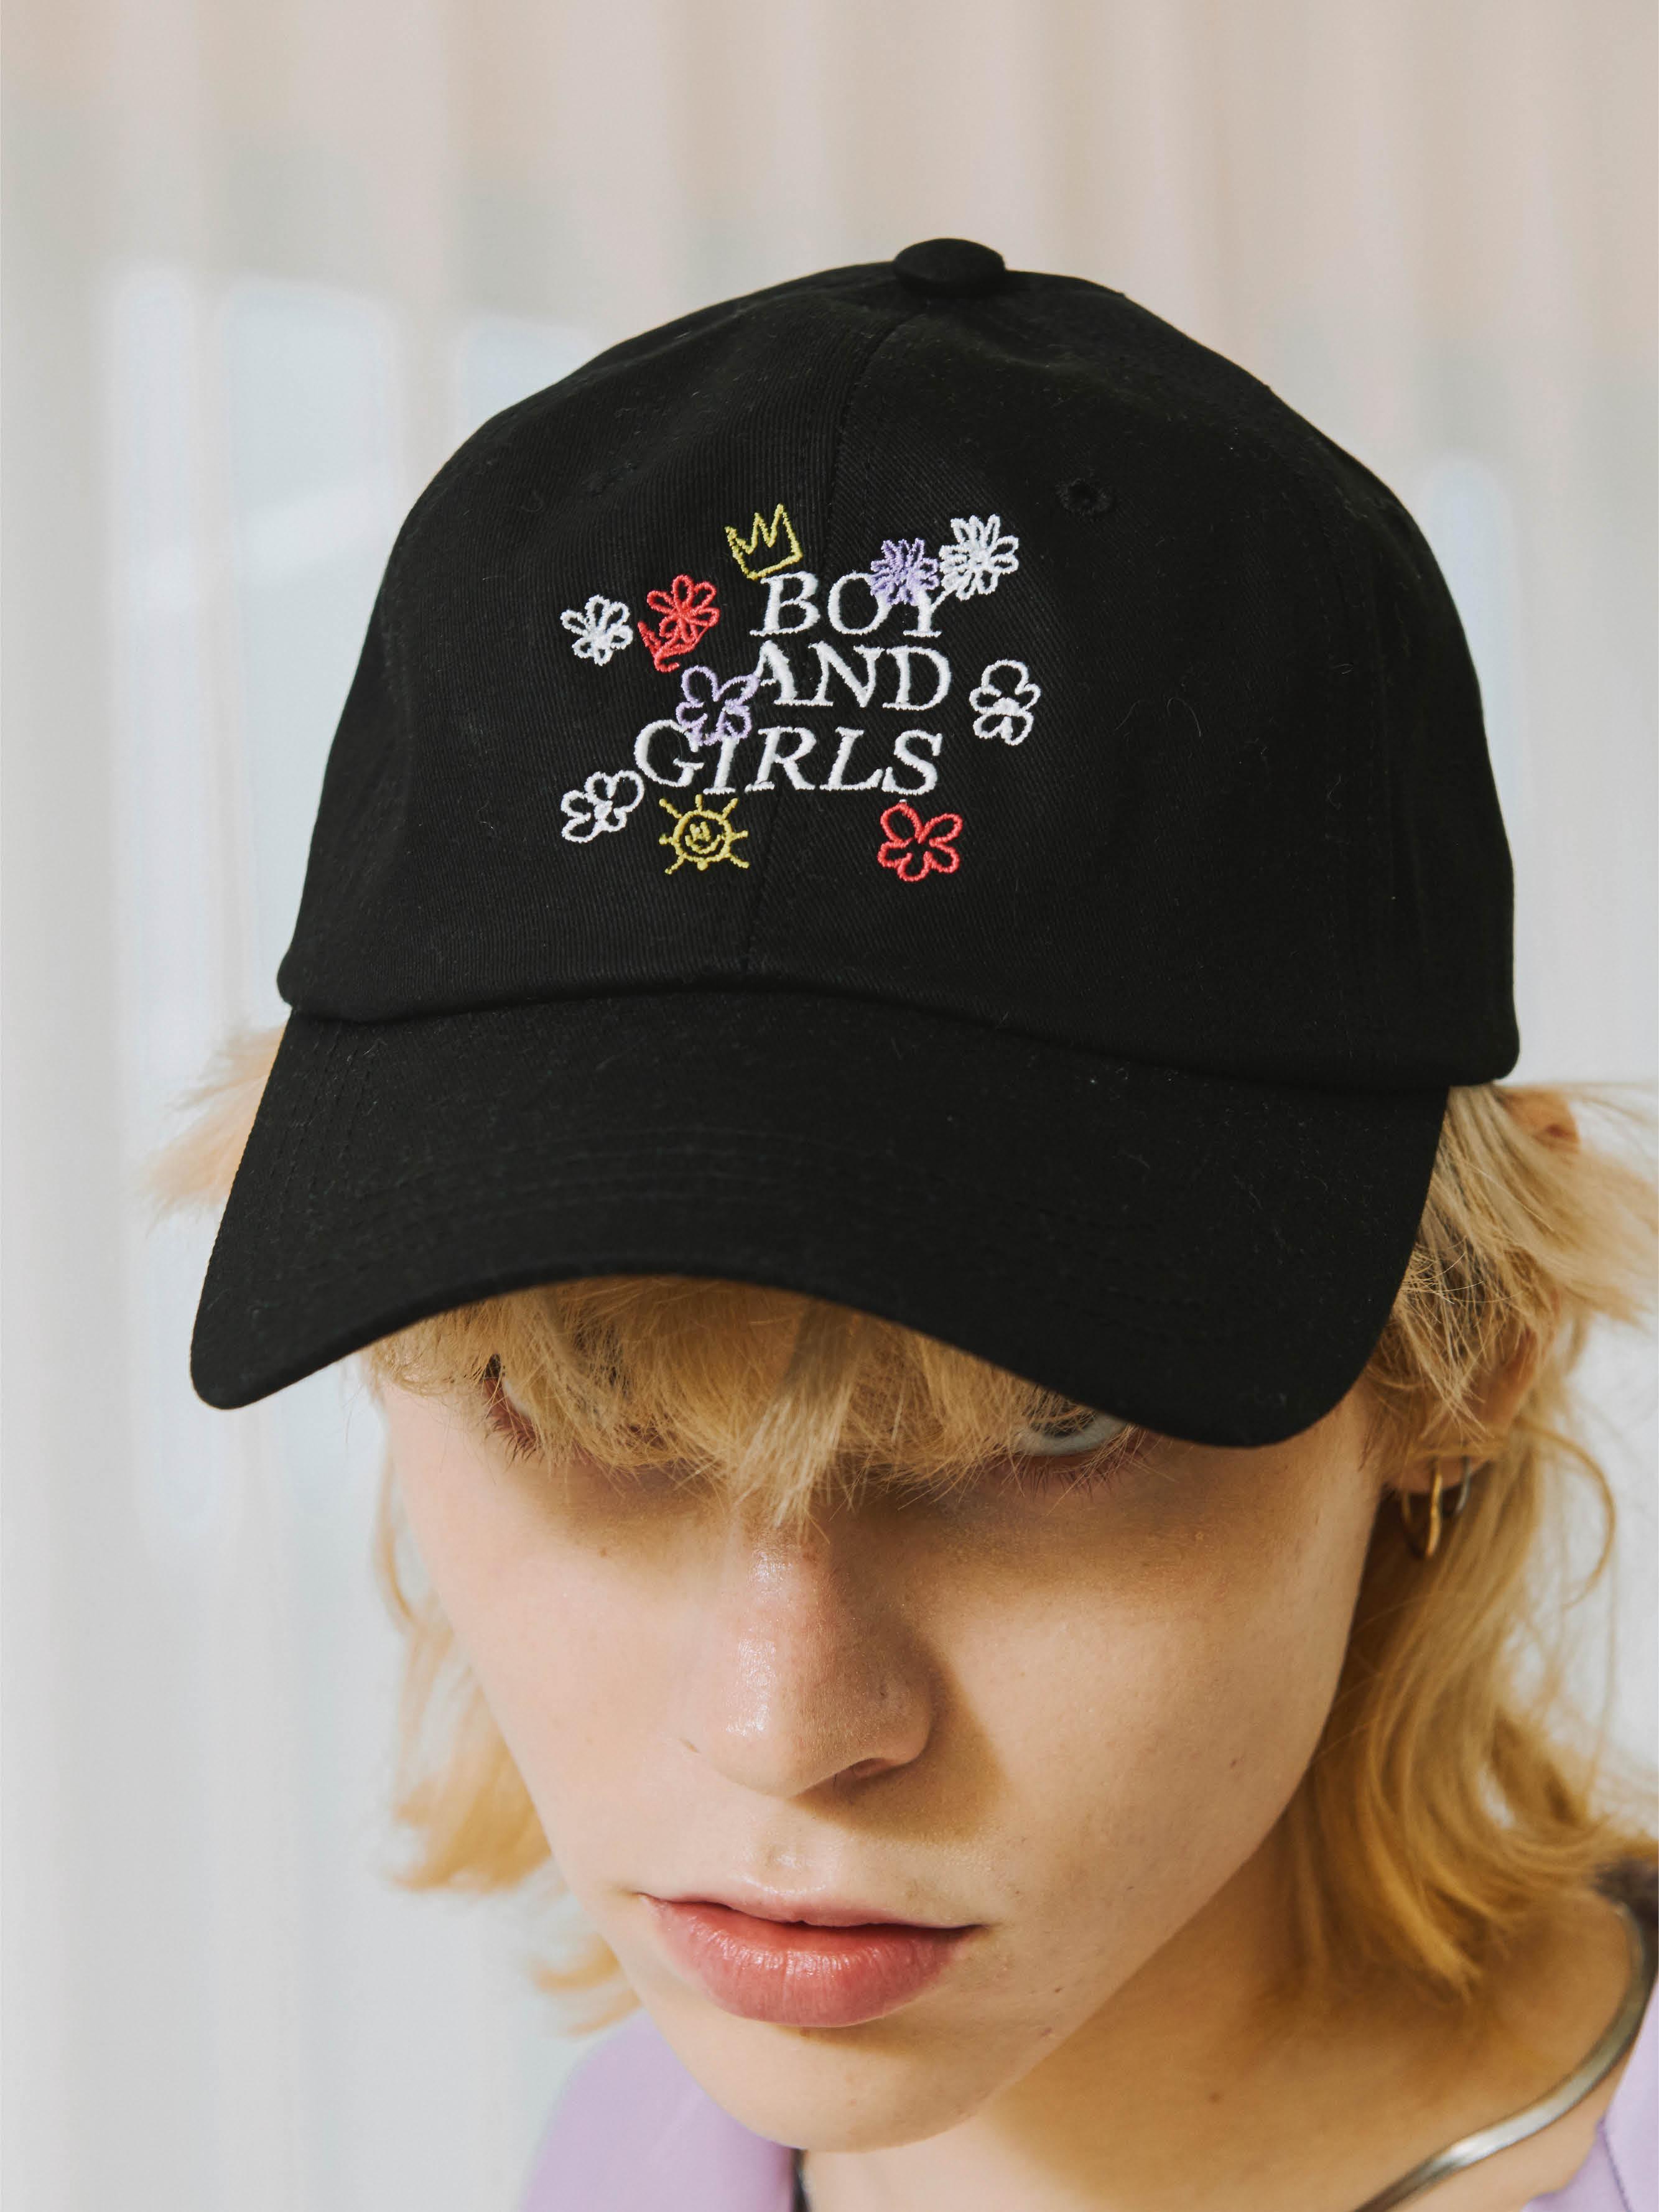 [Ship date: 9/17] BOY AND GIRLS BALL CAP (BLACK)